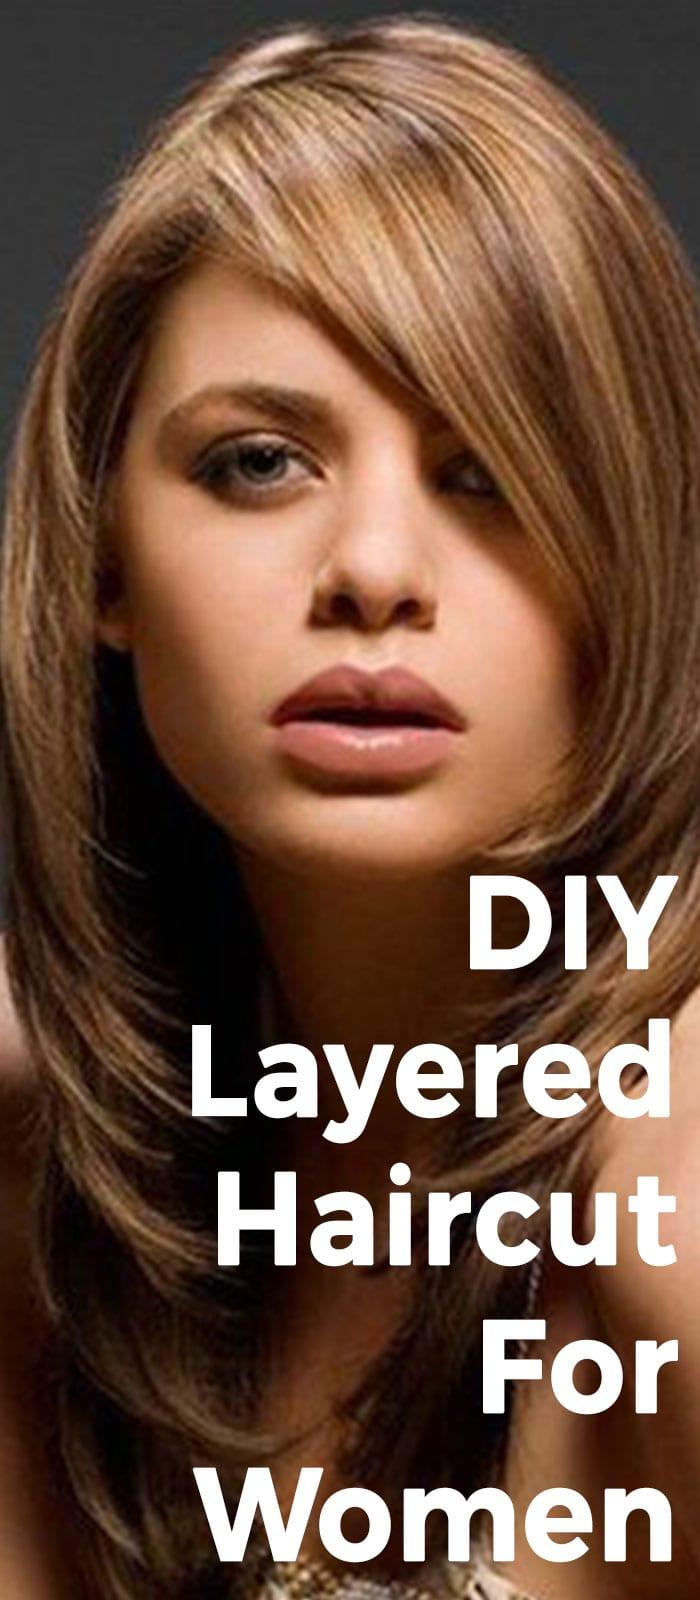 DIY Layered Haircut For Women